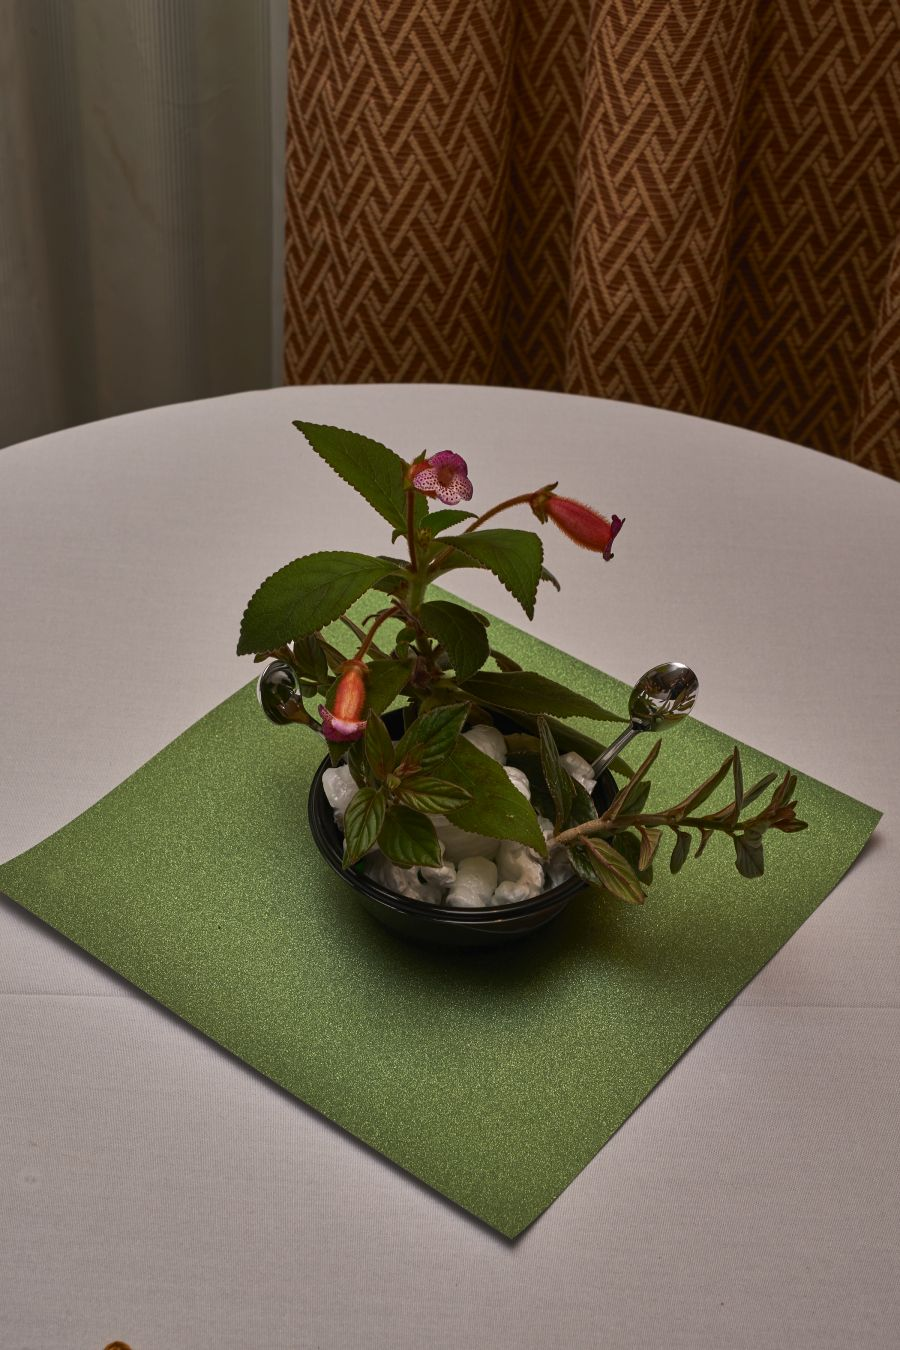 2018 Convention<br>Arrangements of Fresh-Cut Gesneriad Material<br>Class 53